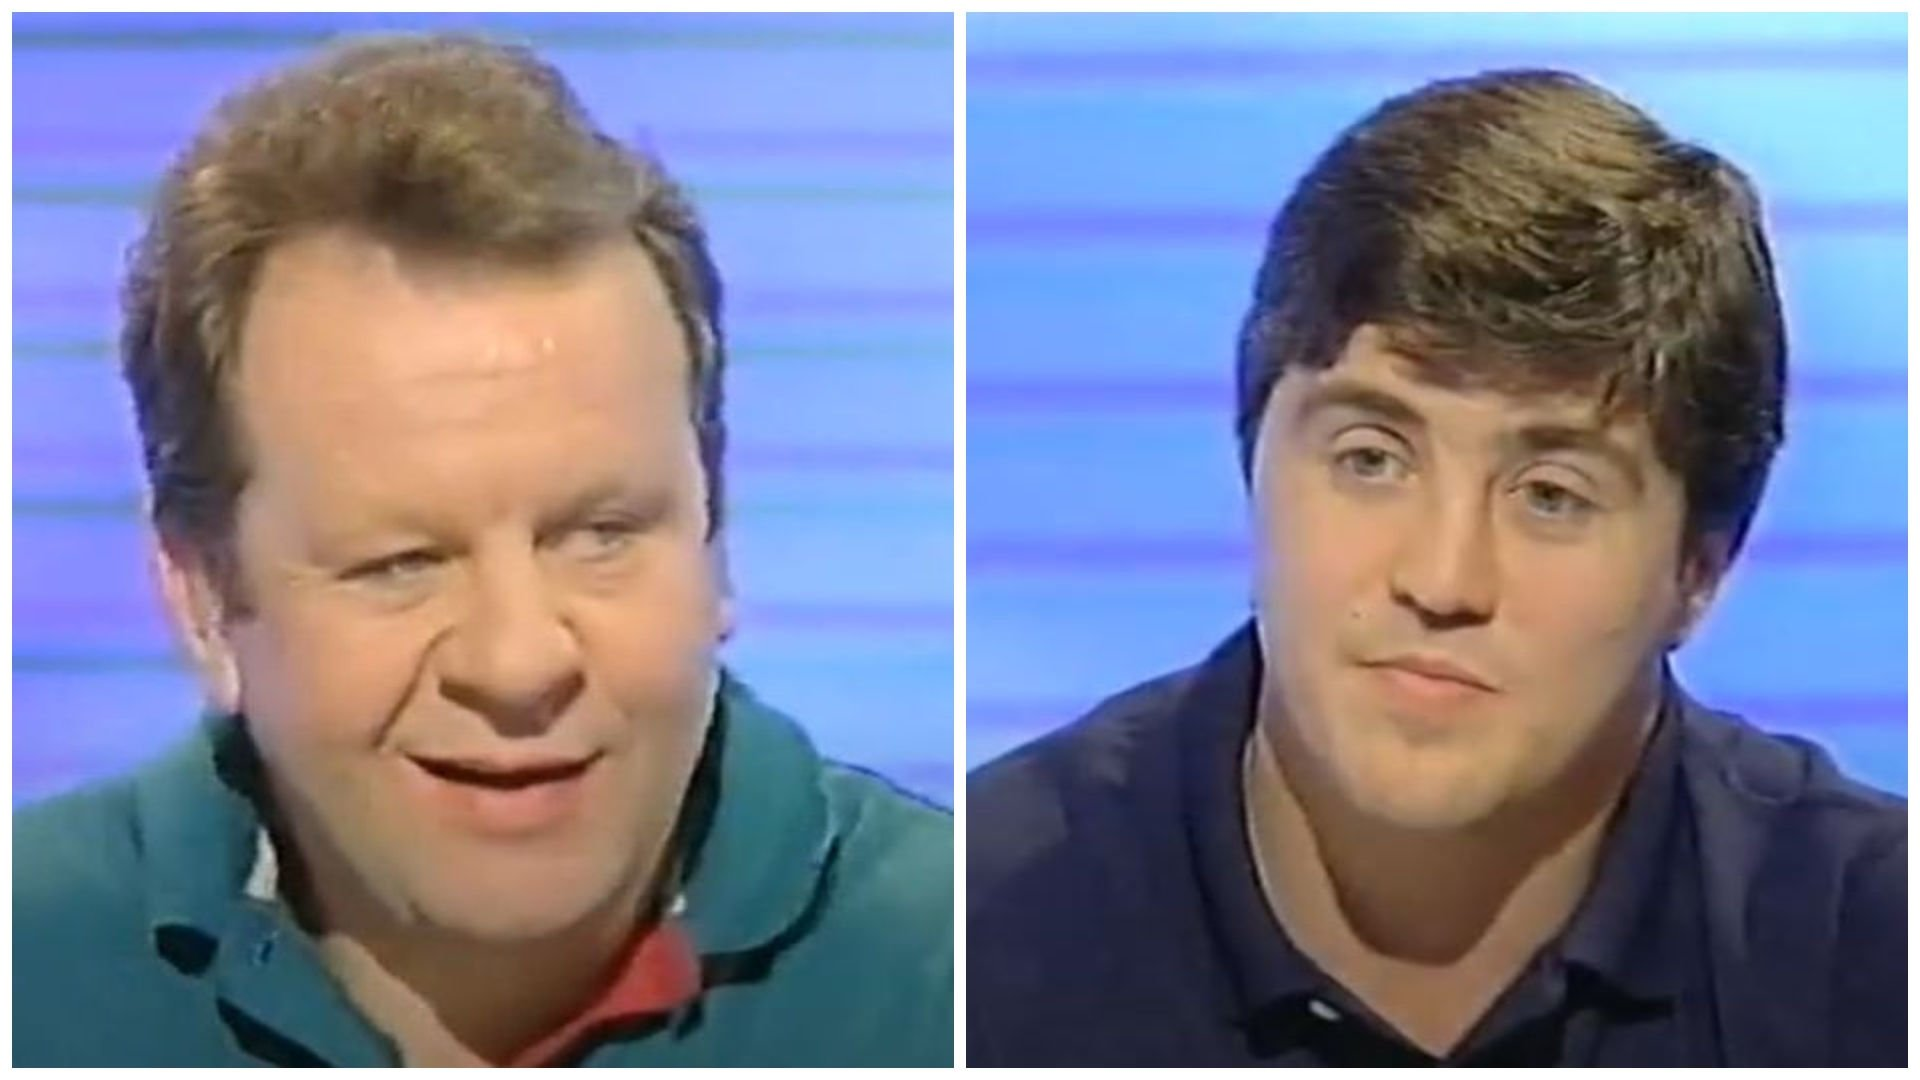 Authoritative and masterful Bill Beaumont belittles Stuart Barnes with devastating IQ on 1993 quiz show